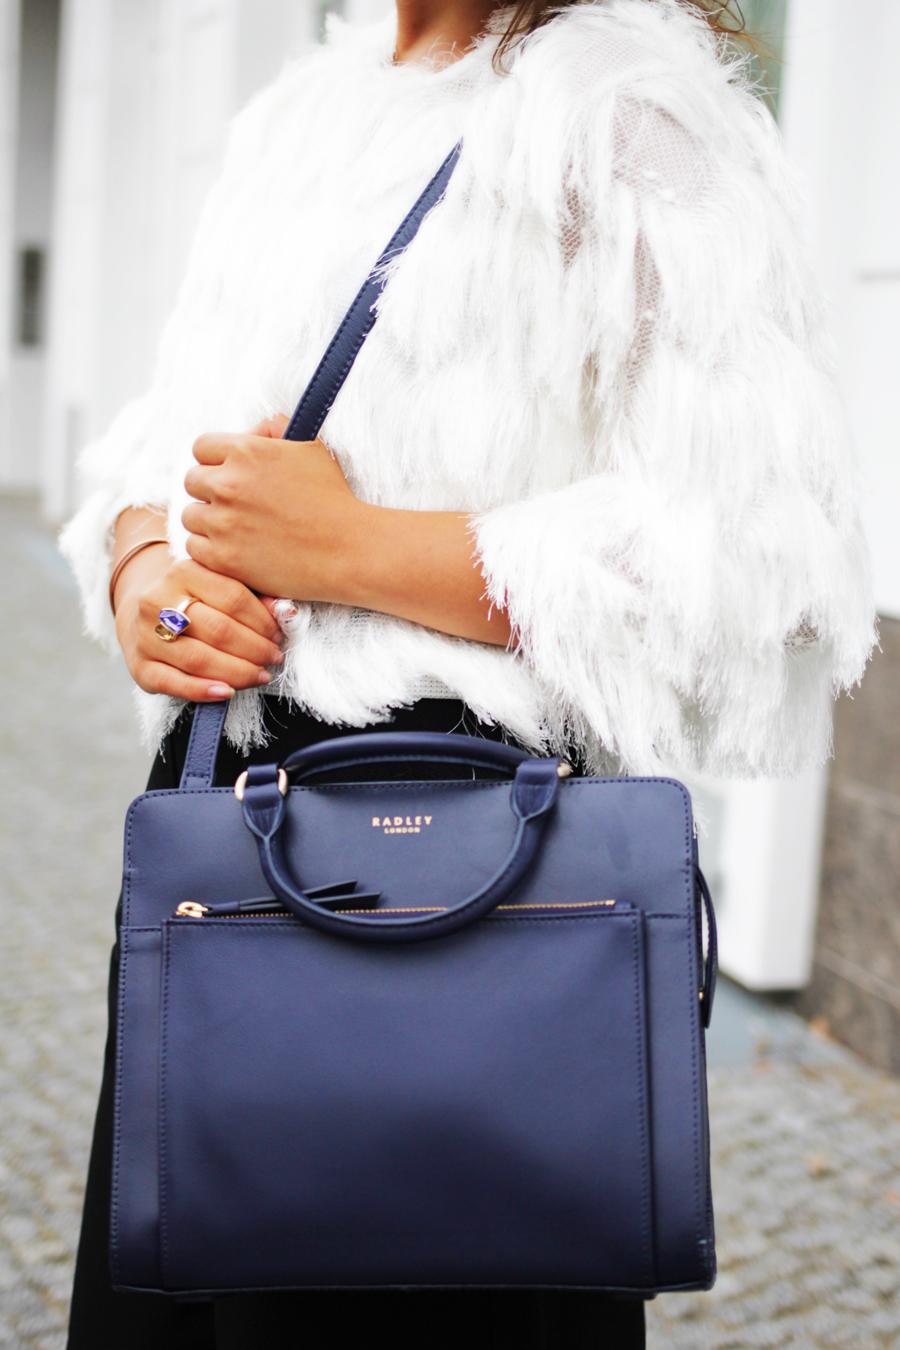 radley bags detail mode tasche